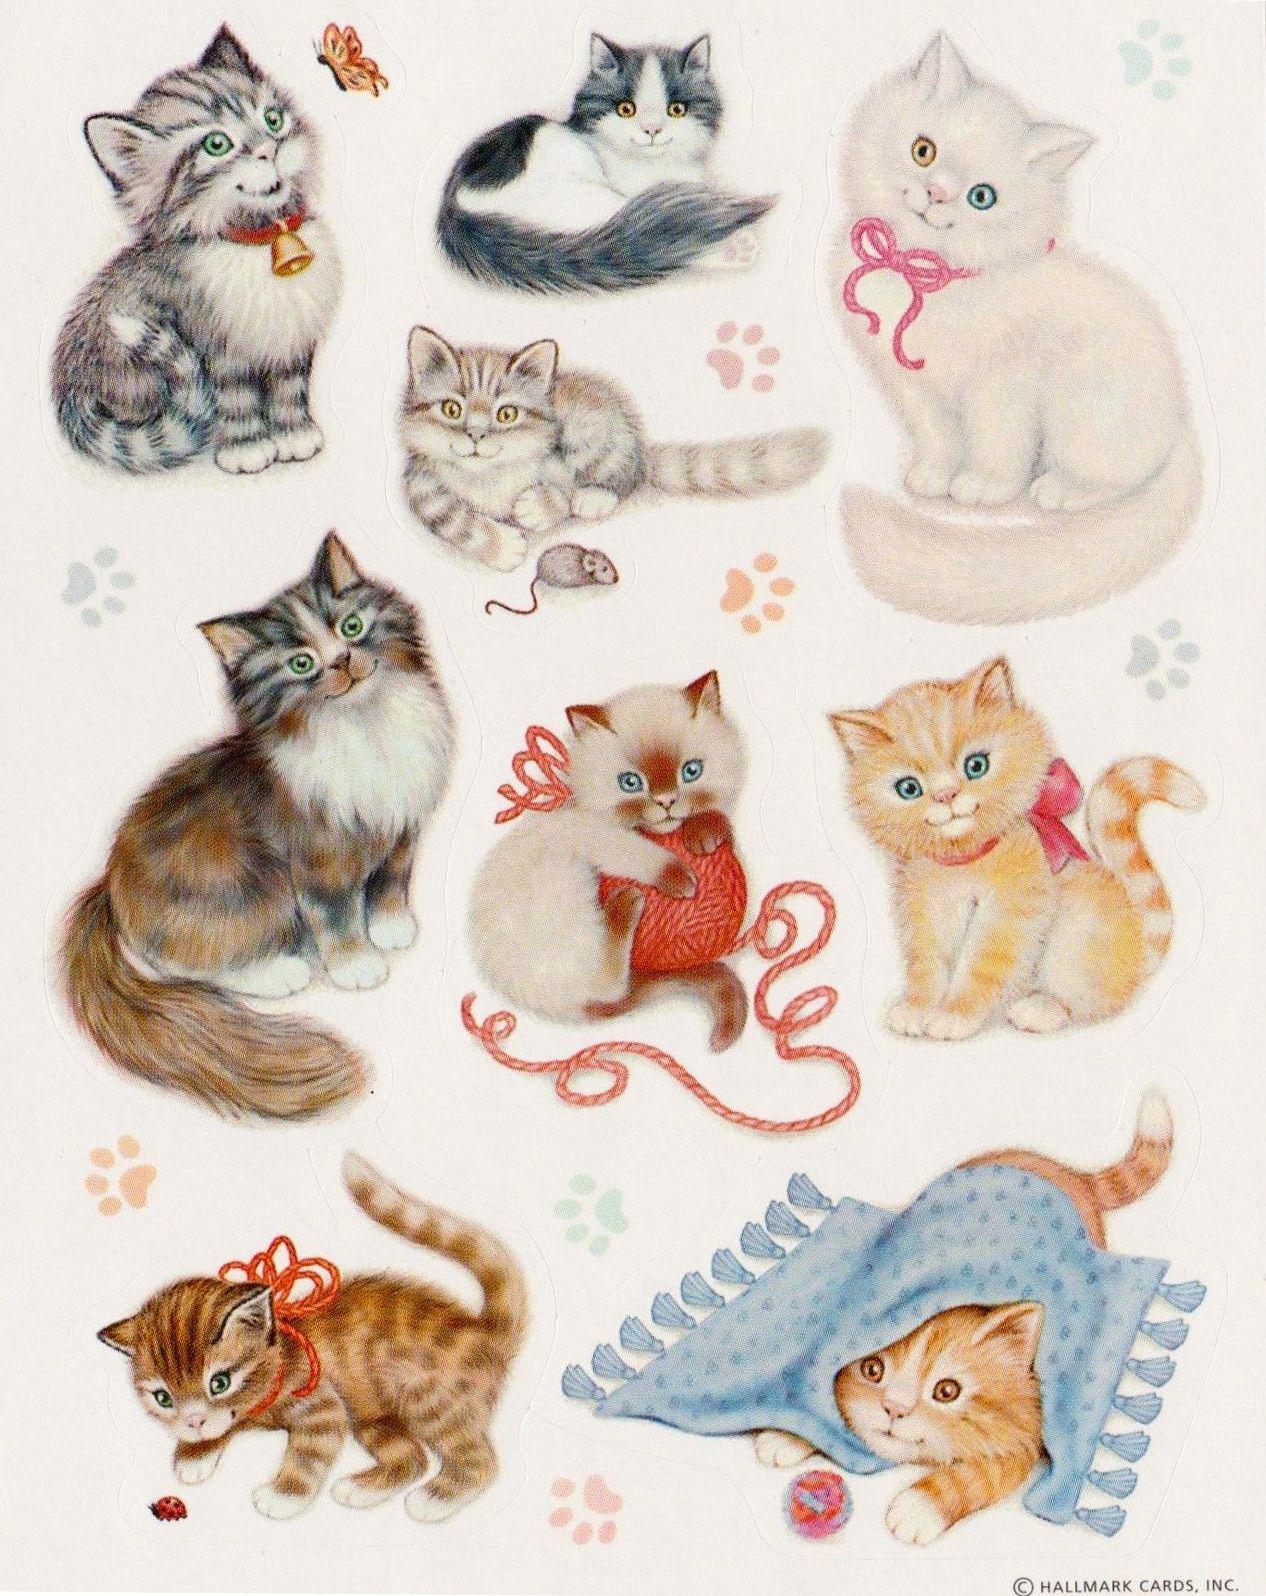 Hallmark Stickers Beautiful Cats Cat Stickers Kittens Vintage